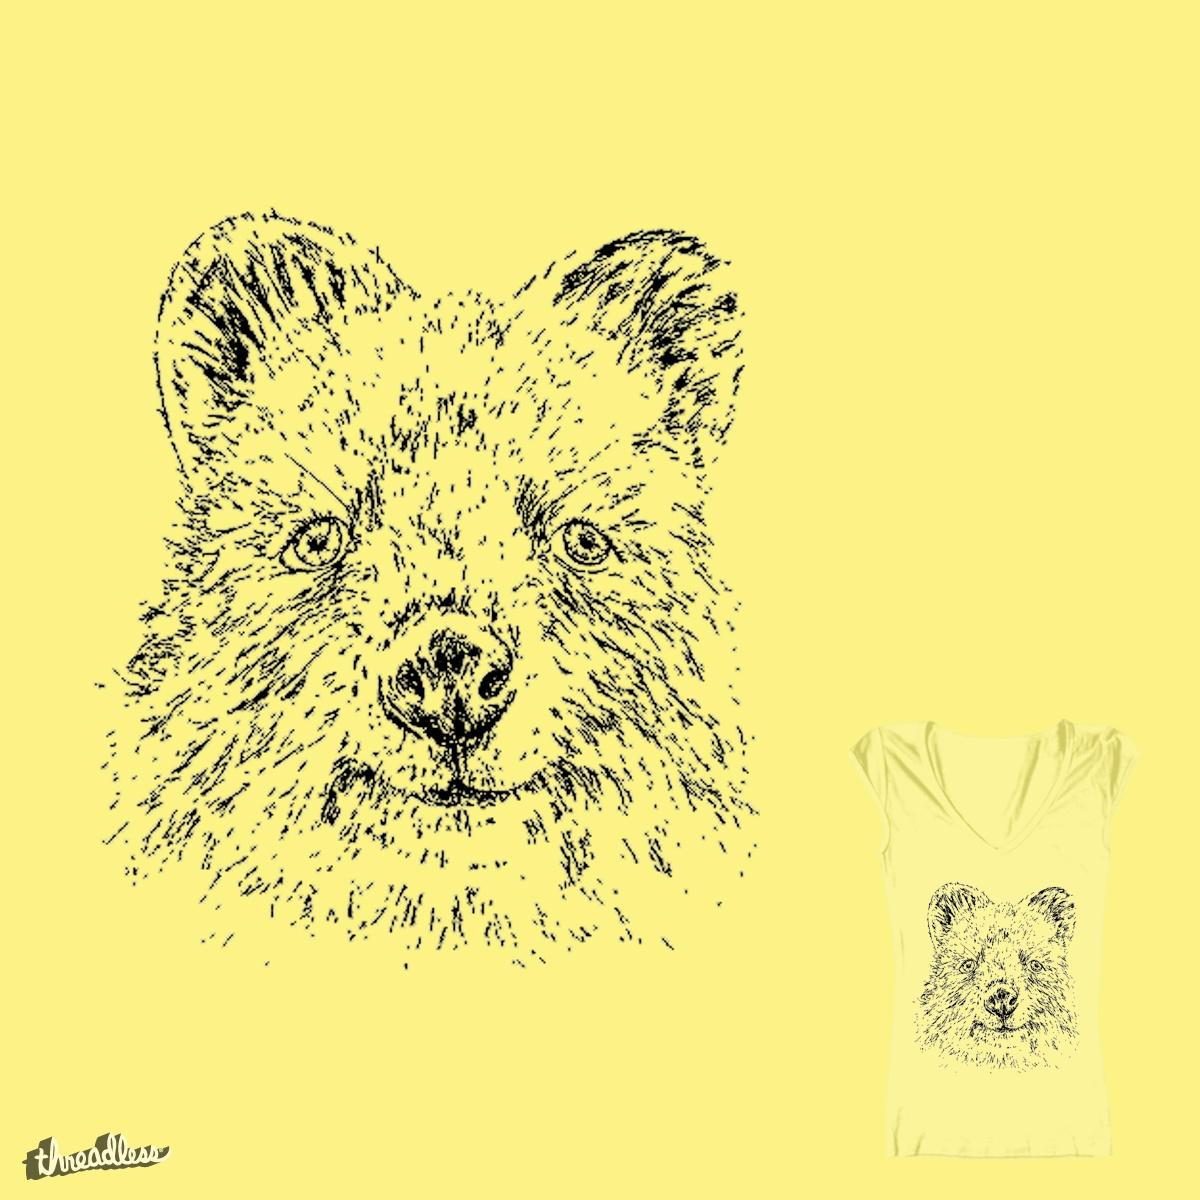 Score ANIMAL EYES QUOKKA by francesca.cirny.1 on Threadless